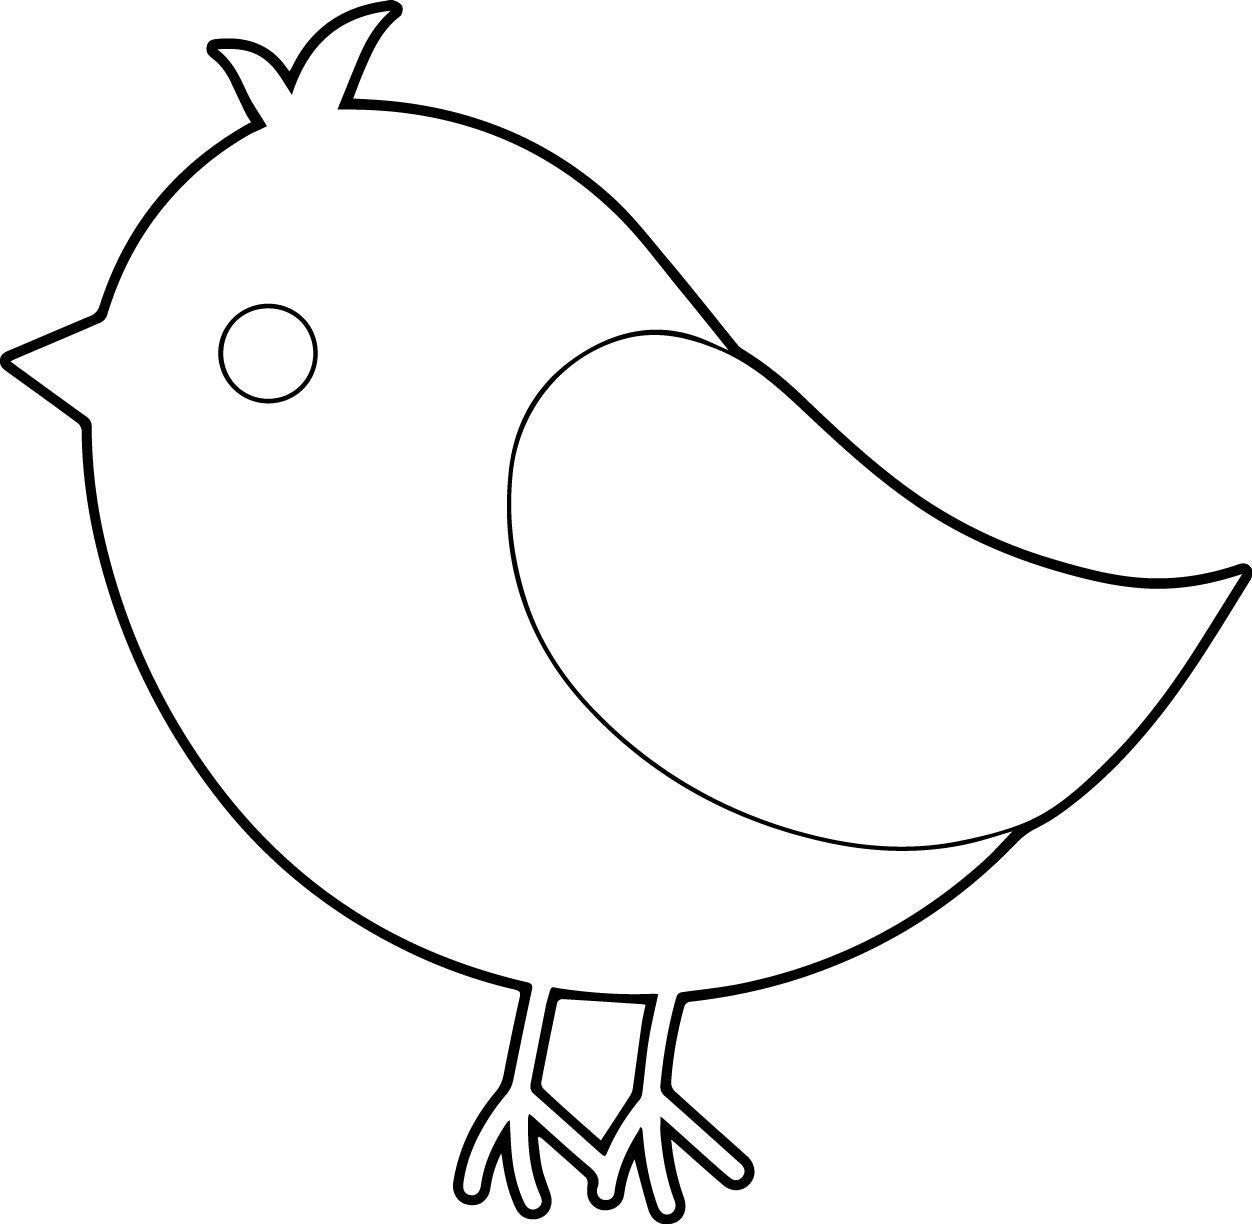 Simple Bird Coloring Page | Preschool Ideas | Pinterest ...